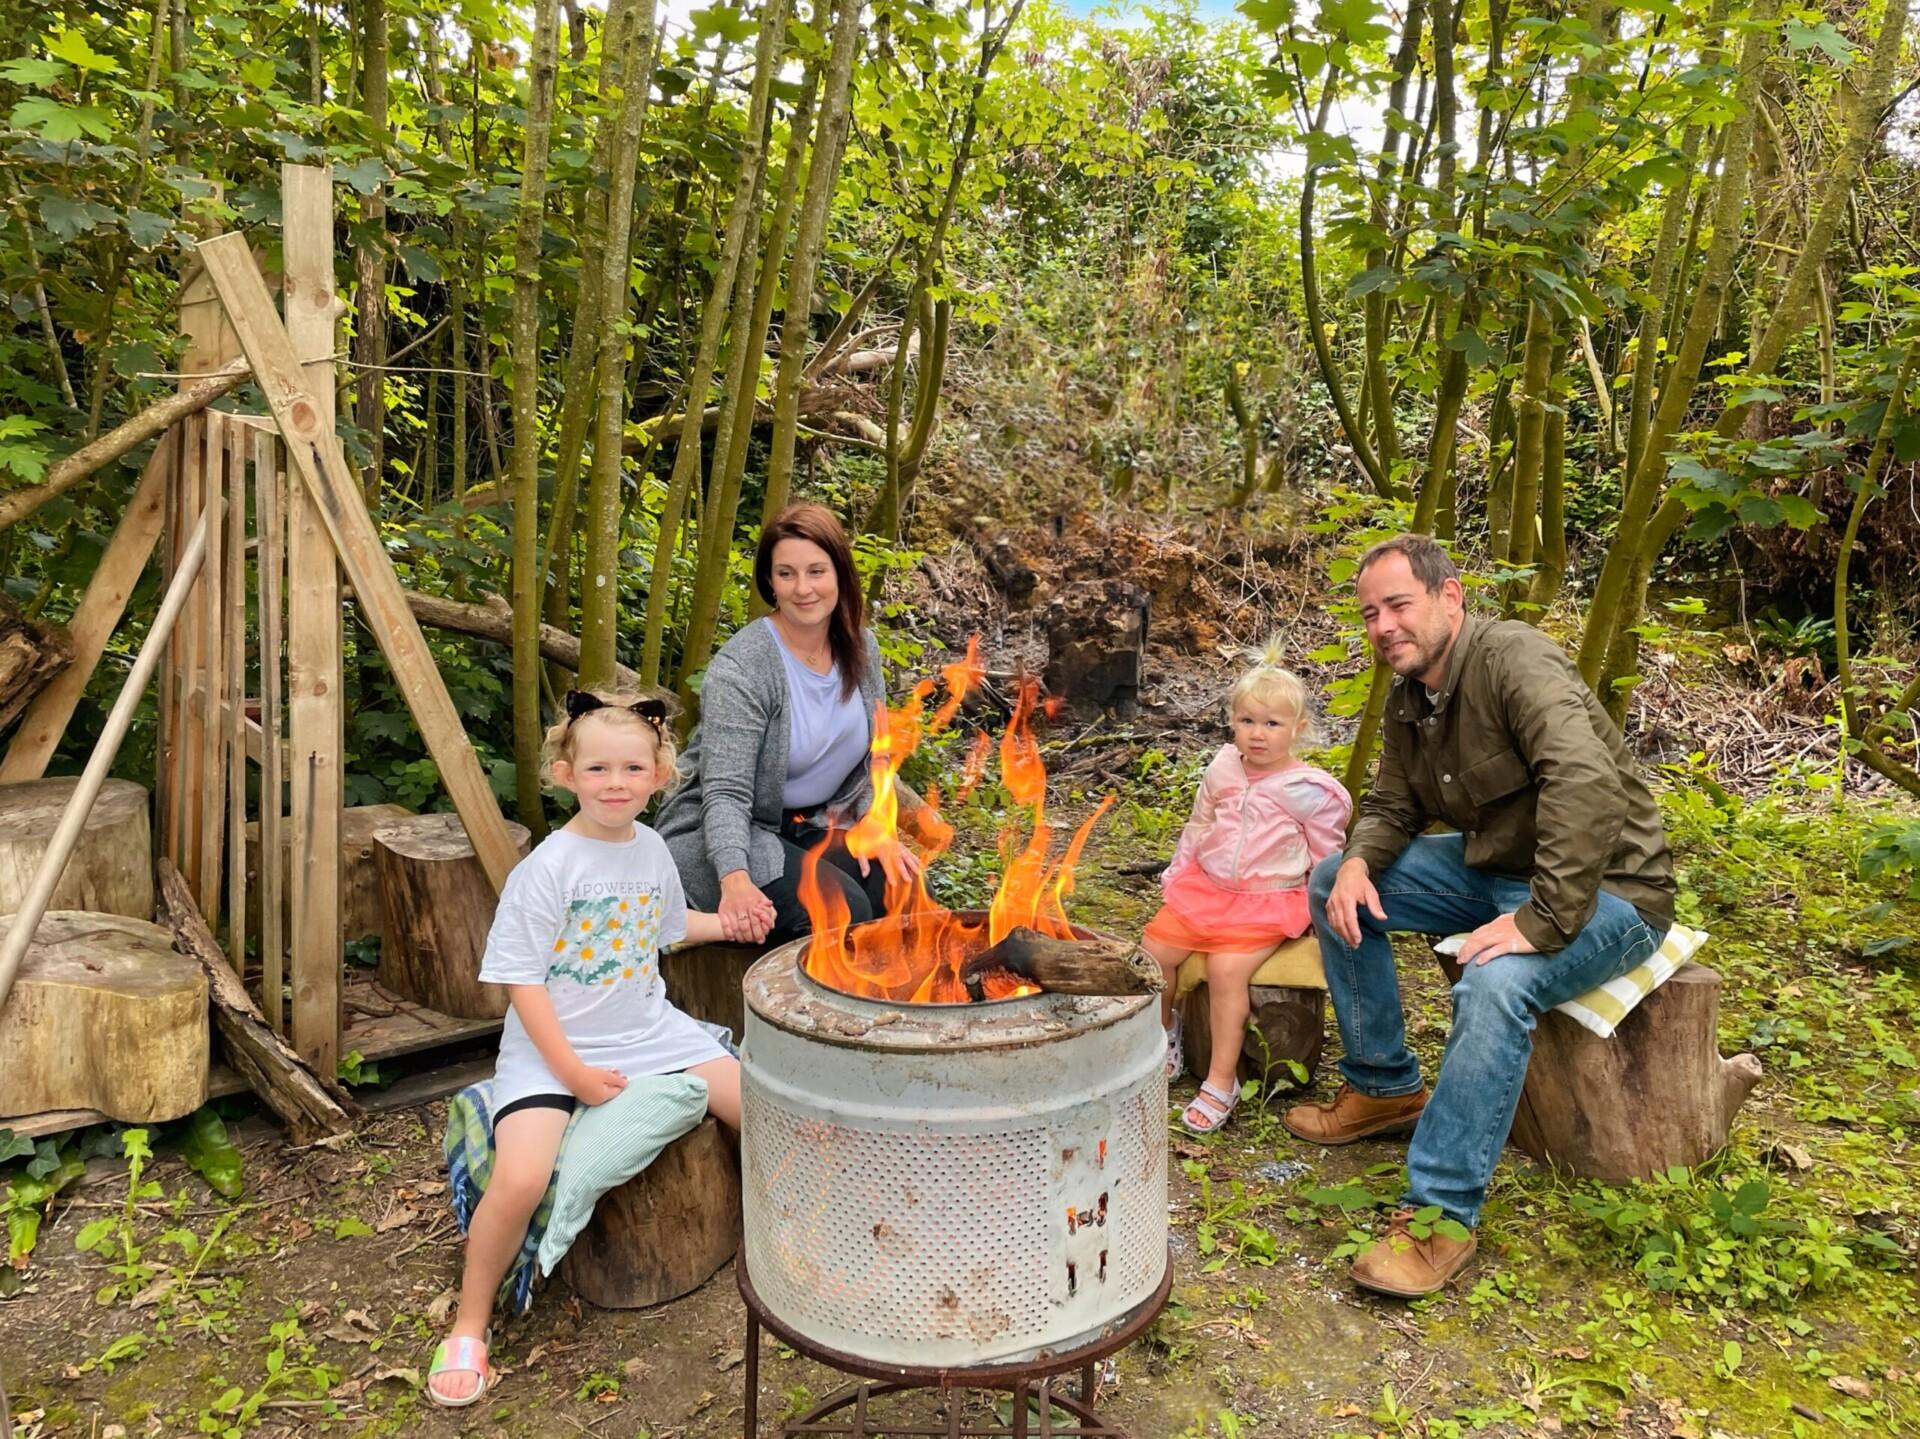 Court Farm Holidays Woodland Fire Pit Marshmallow Toasting